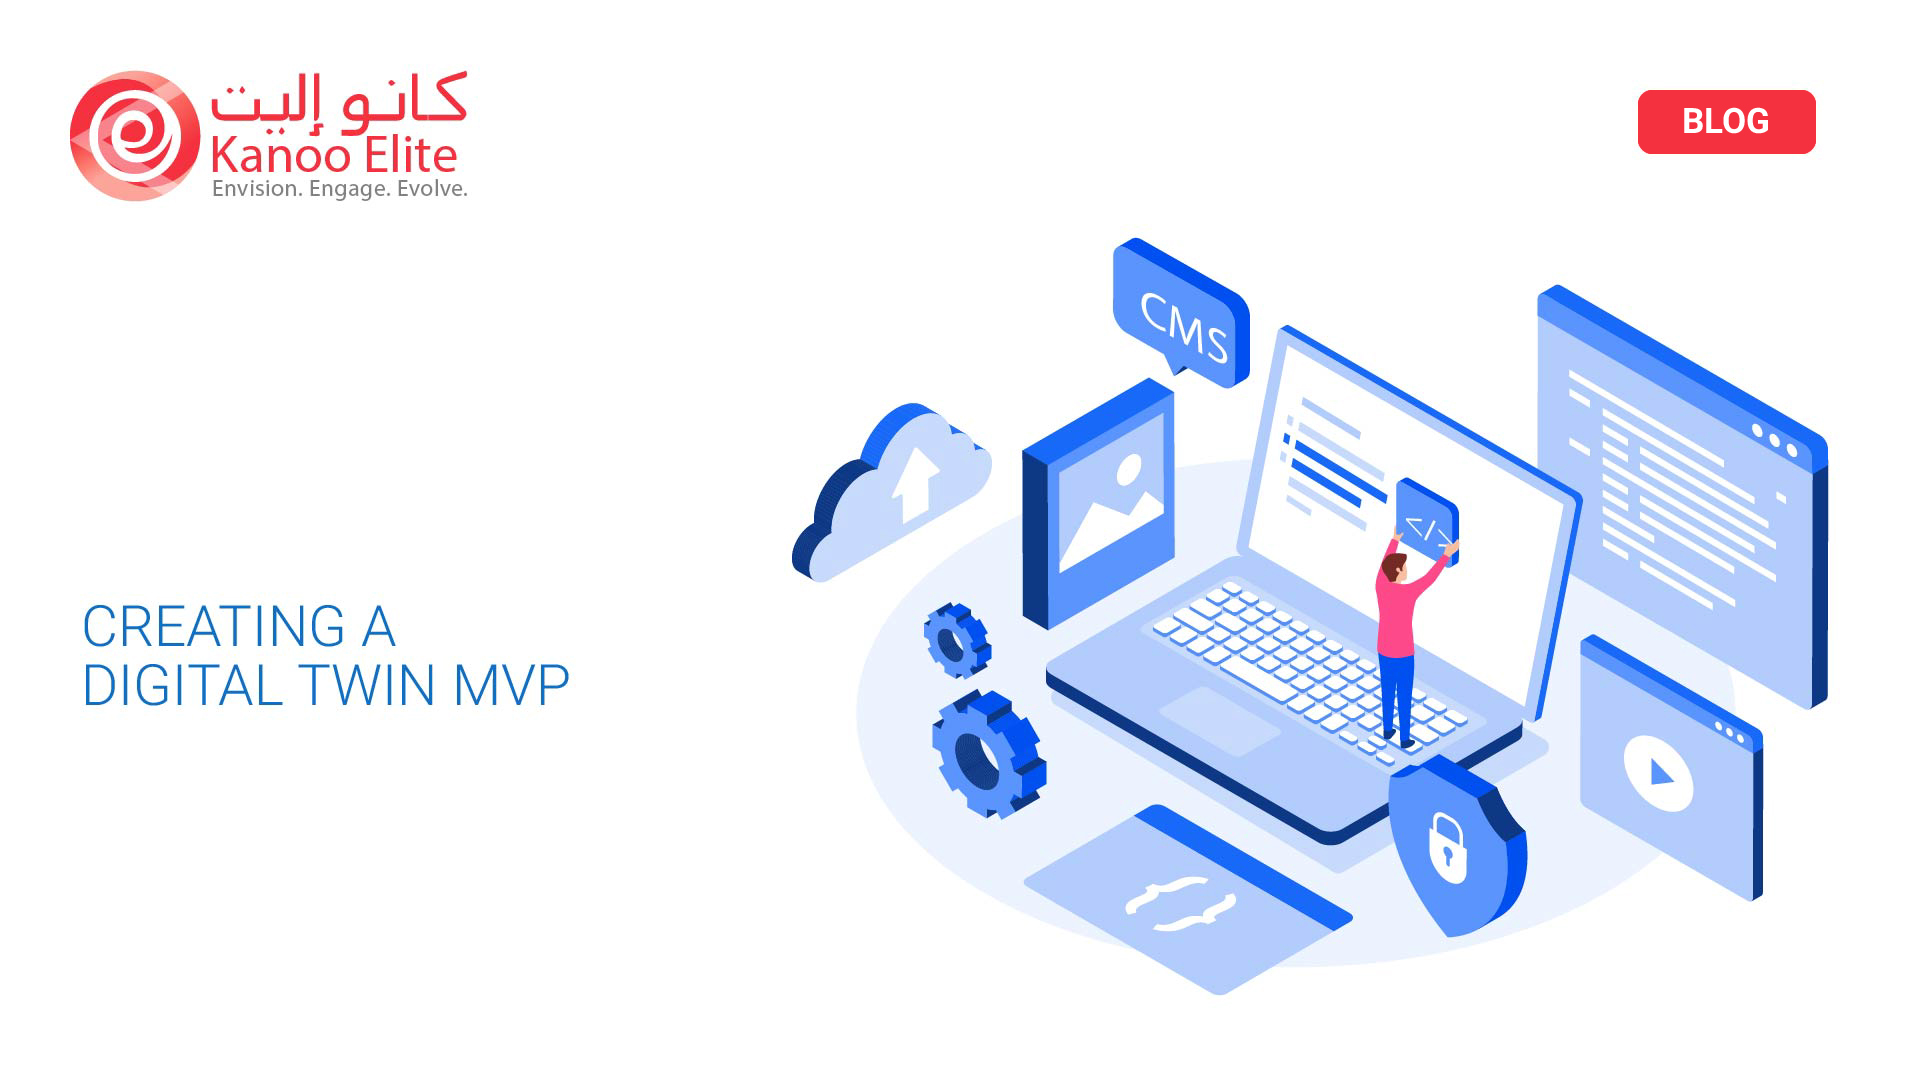 Creating a Digital Twin MVP